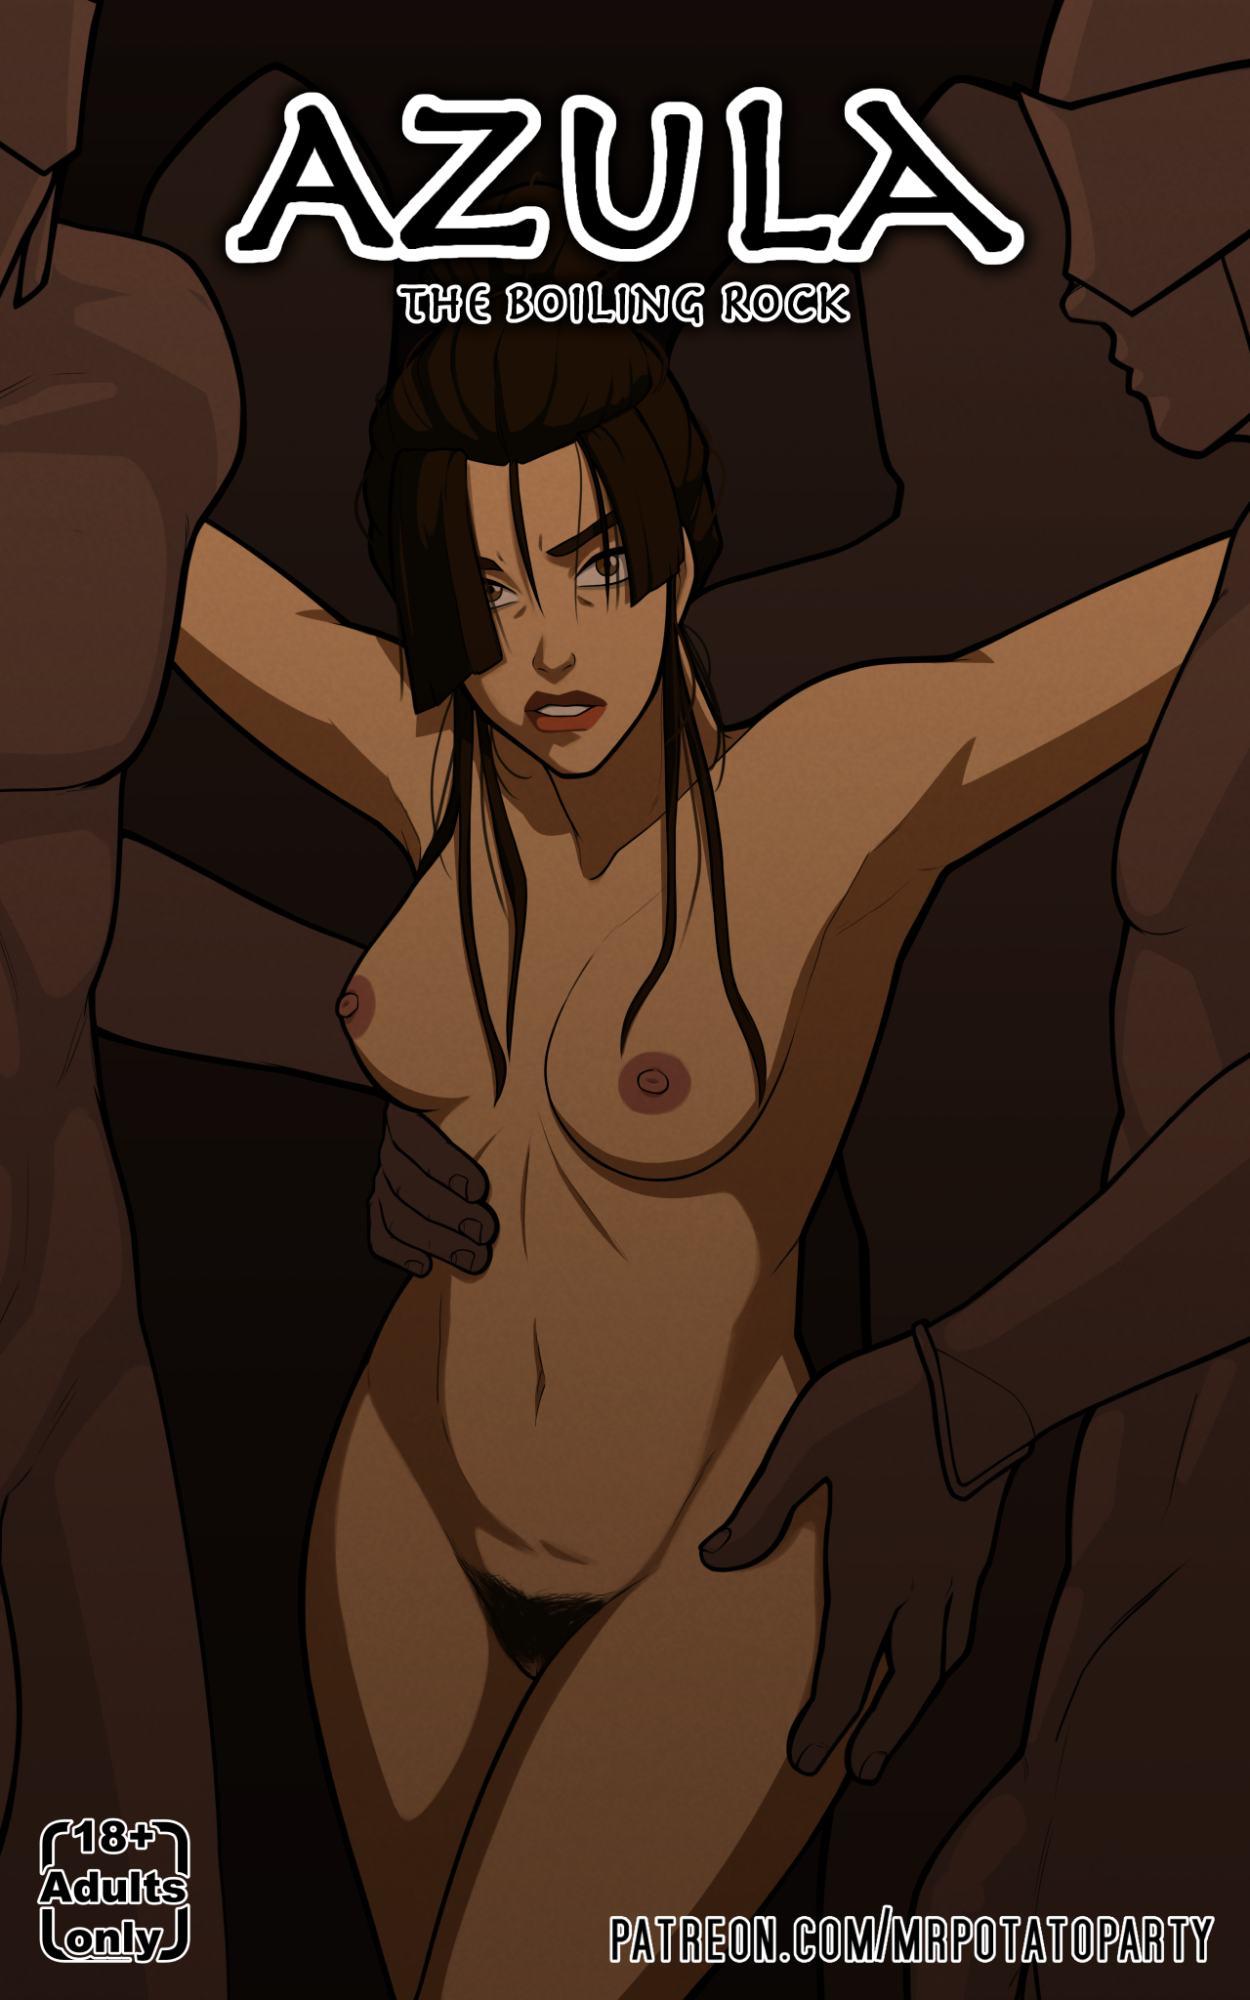 SureFap xxx porno Avatar the Last Airbender - [MrPotatoParty] - Azula - The Boiling Rock